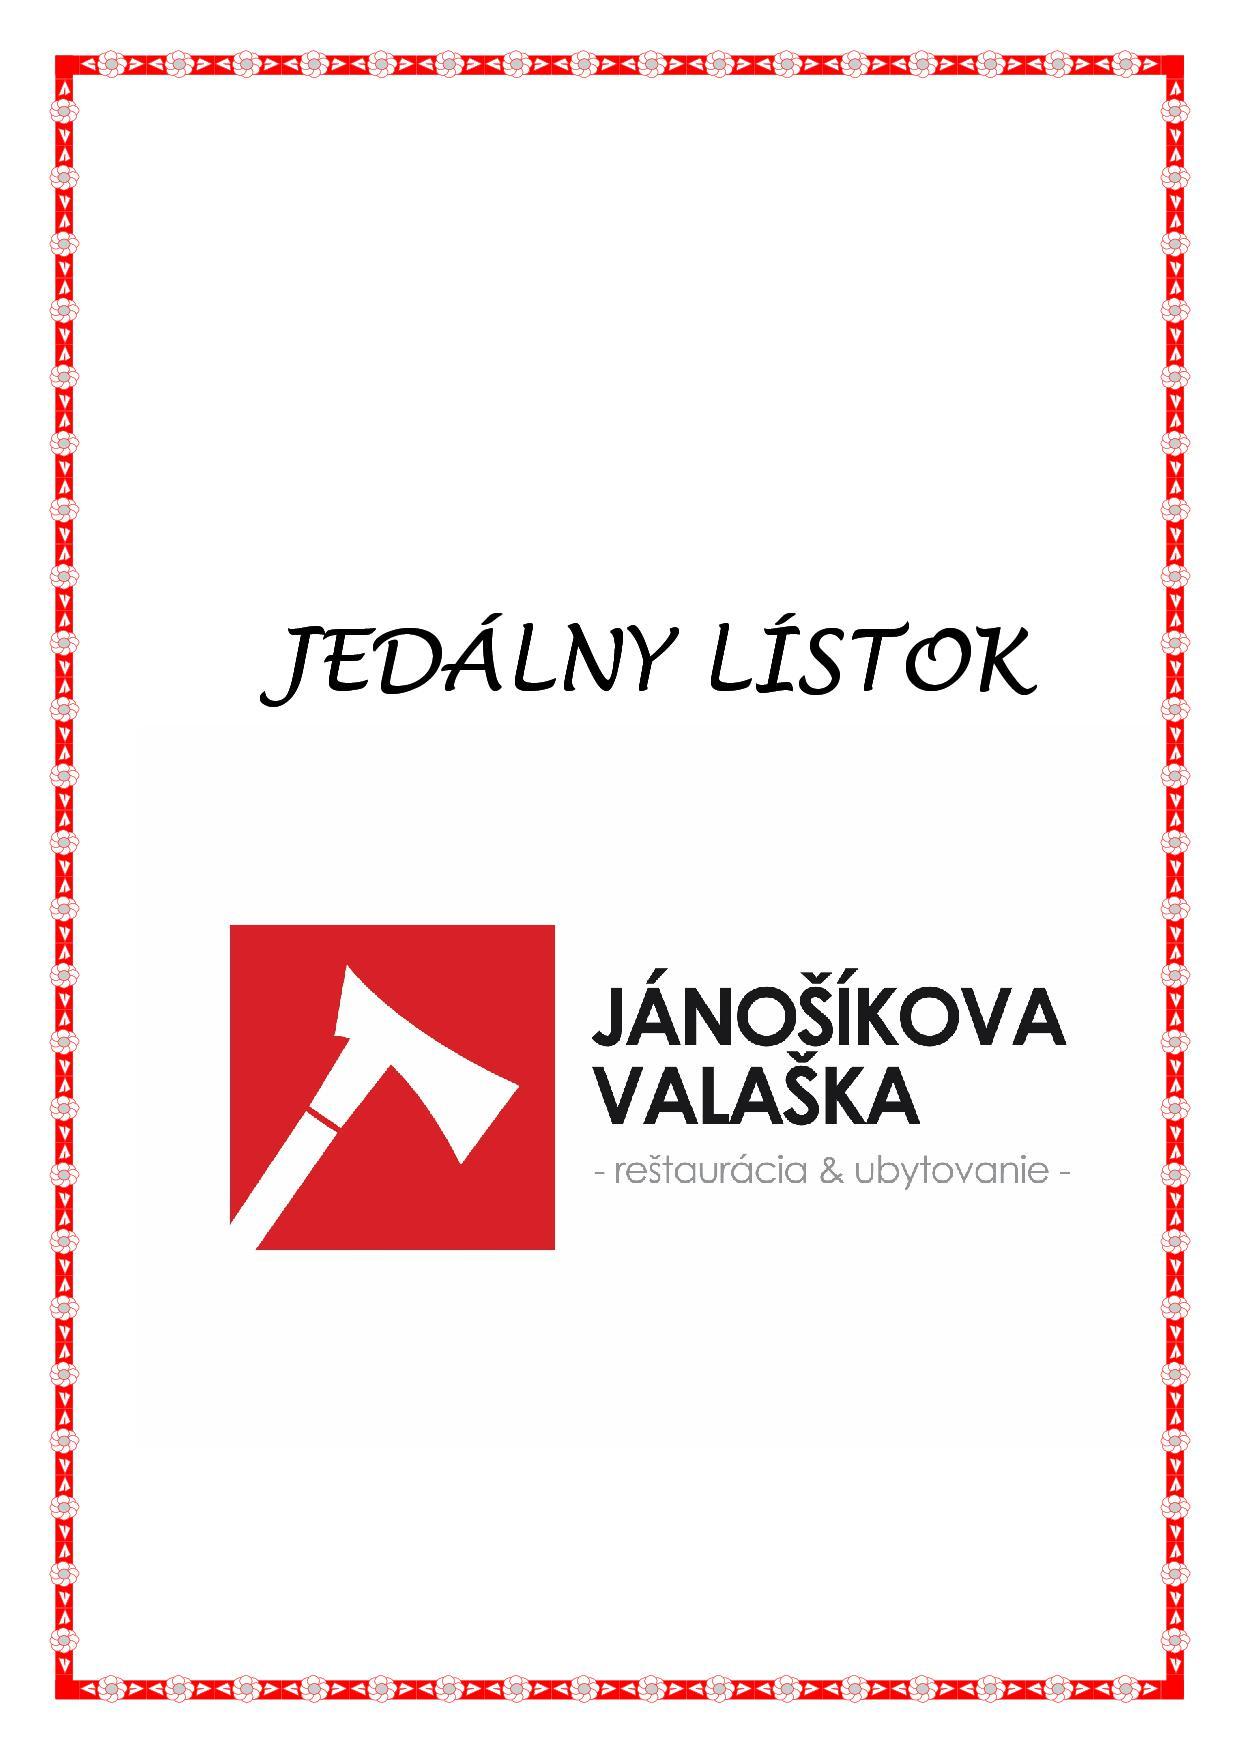 uprava_jadálny_listok1